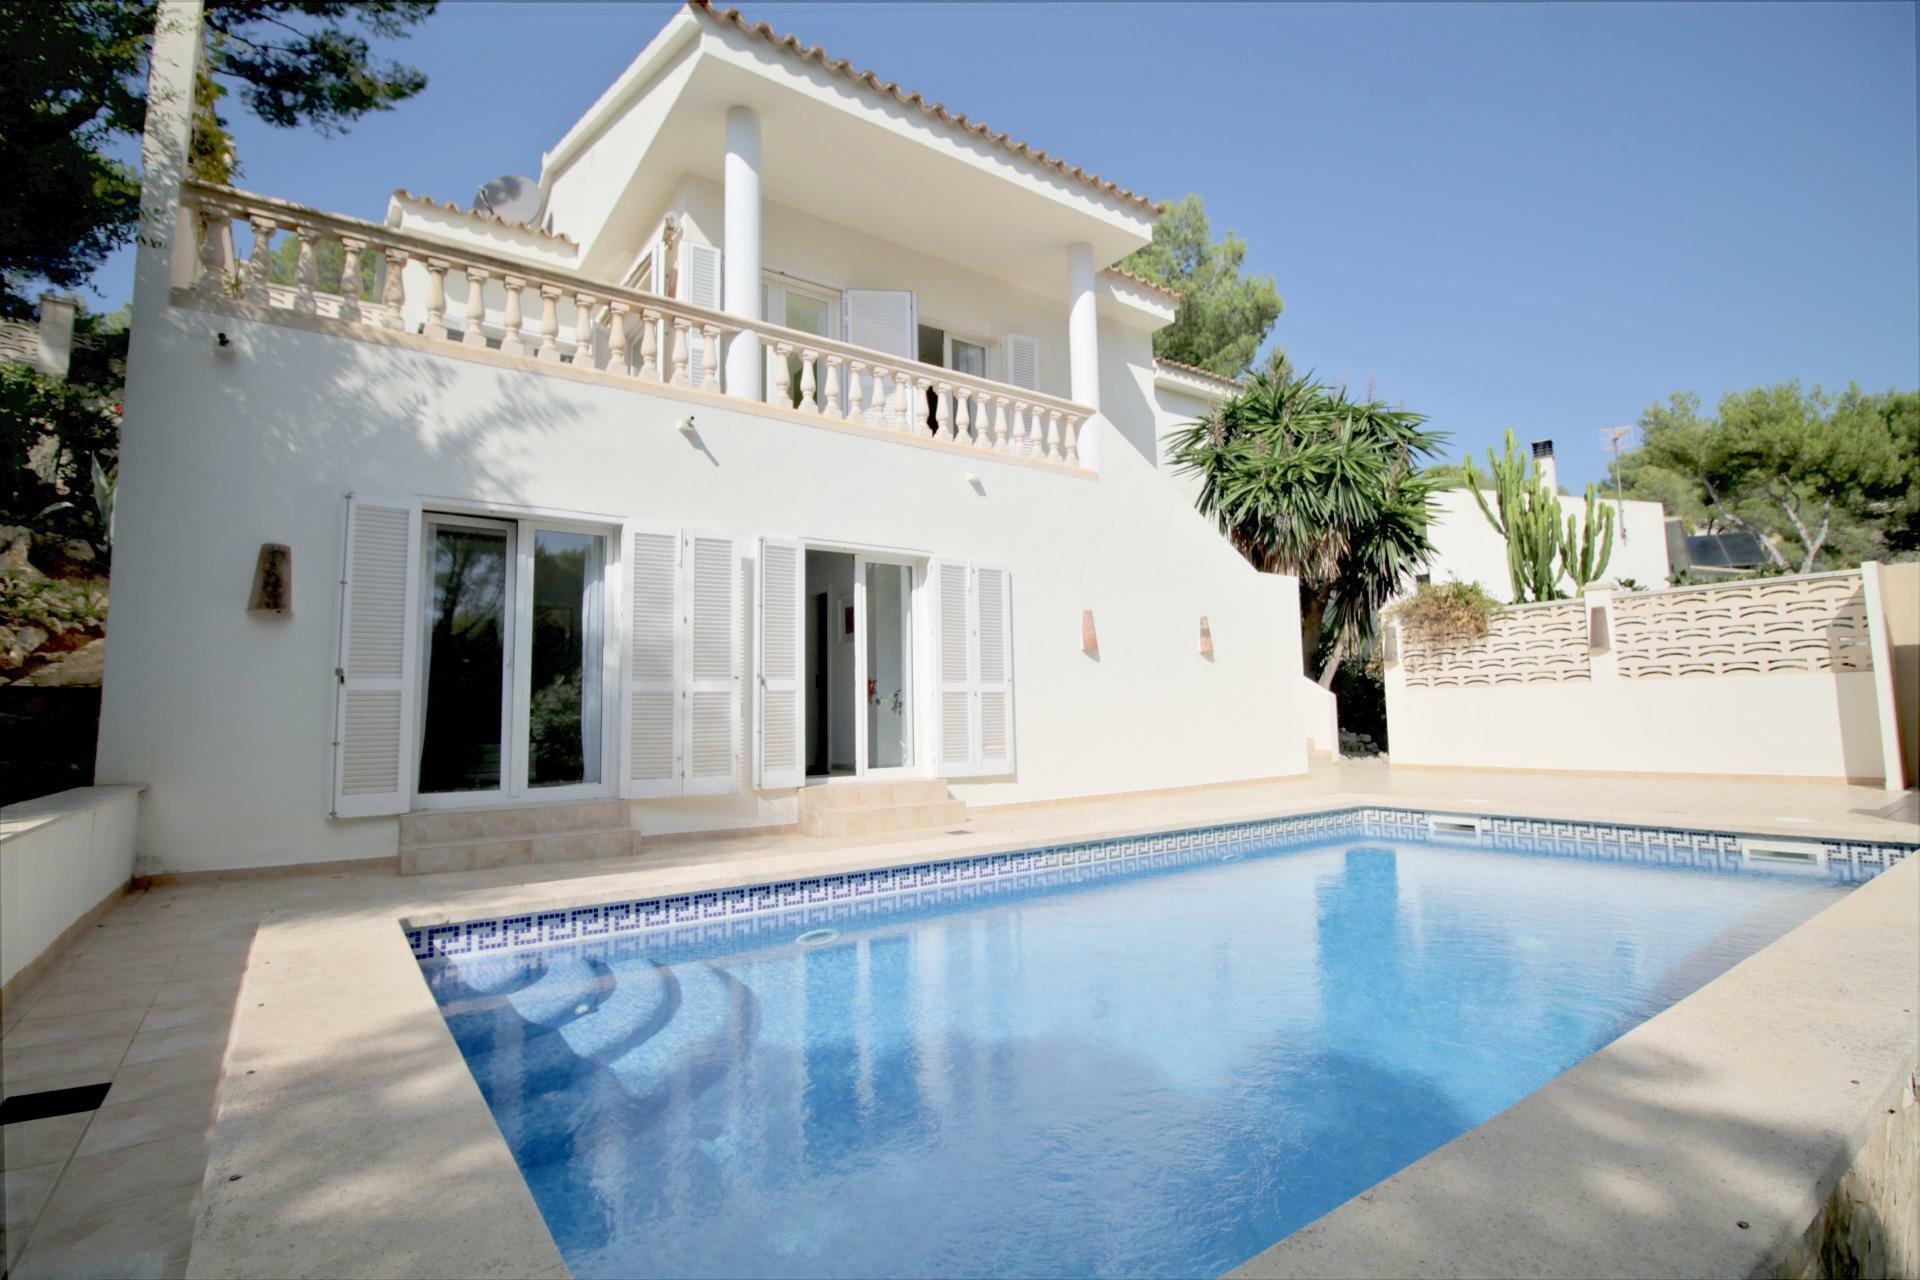 Villa in Costa de la Calma, Balearic Islands, Spain 1